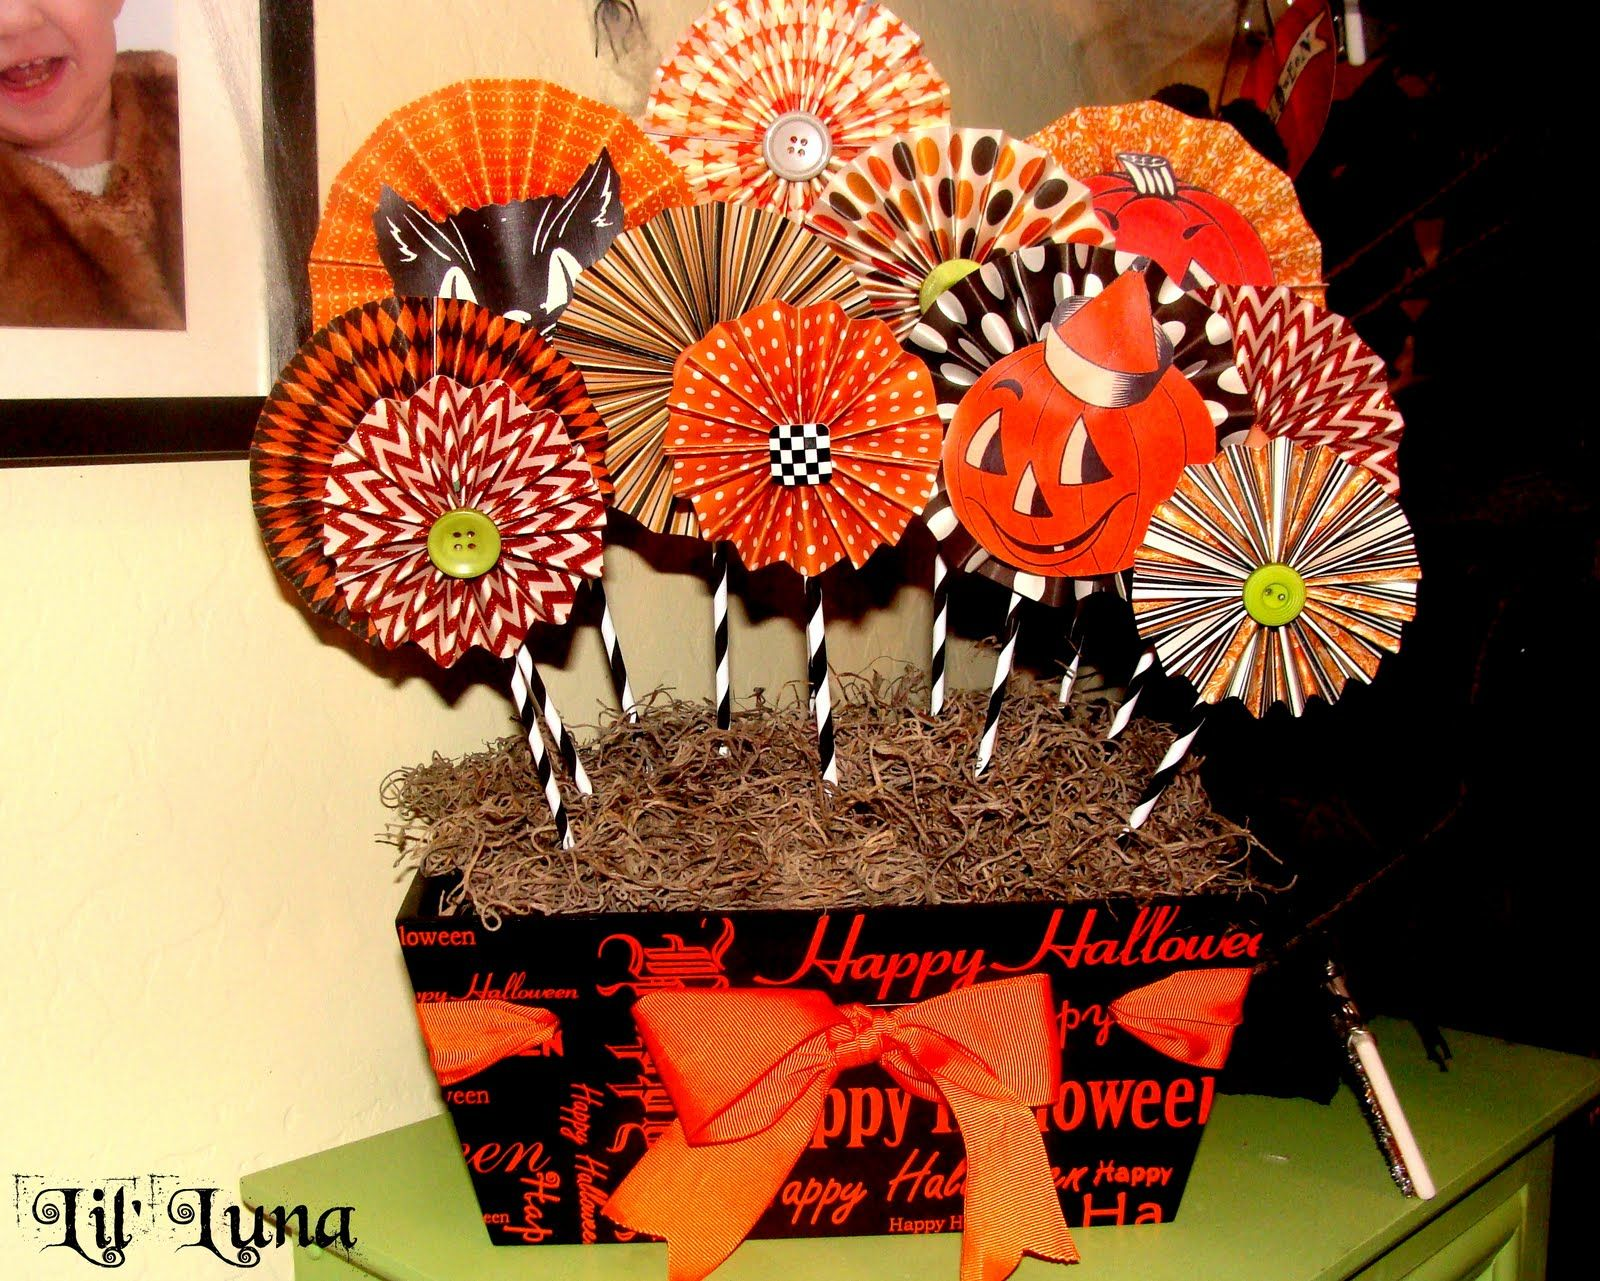 Vintage halloween paper decorations - Halloween Day 13 Vintage Inspired Diy Paper Centerpiece